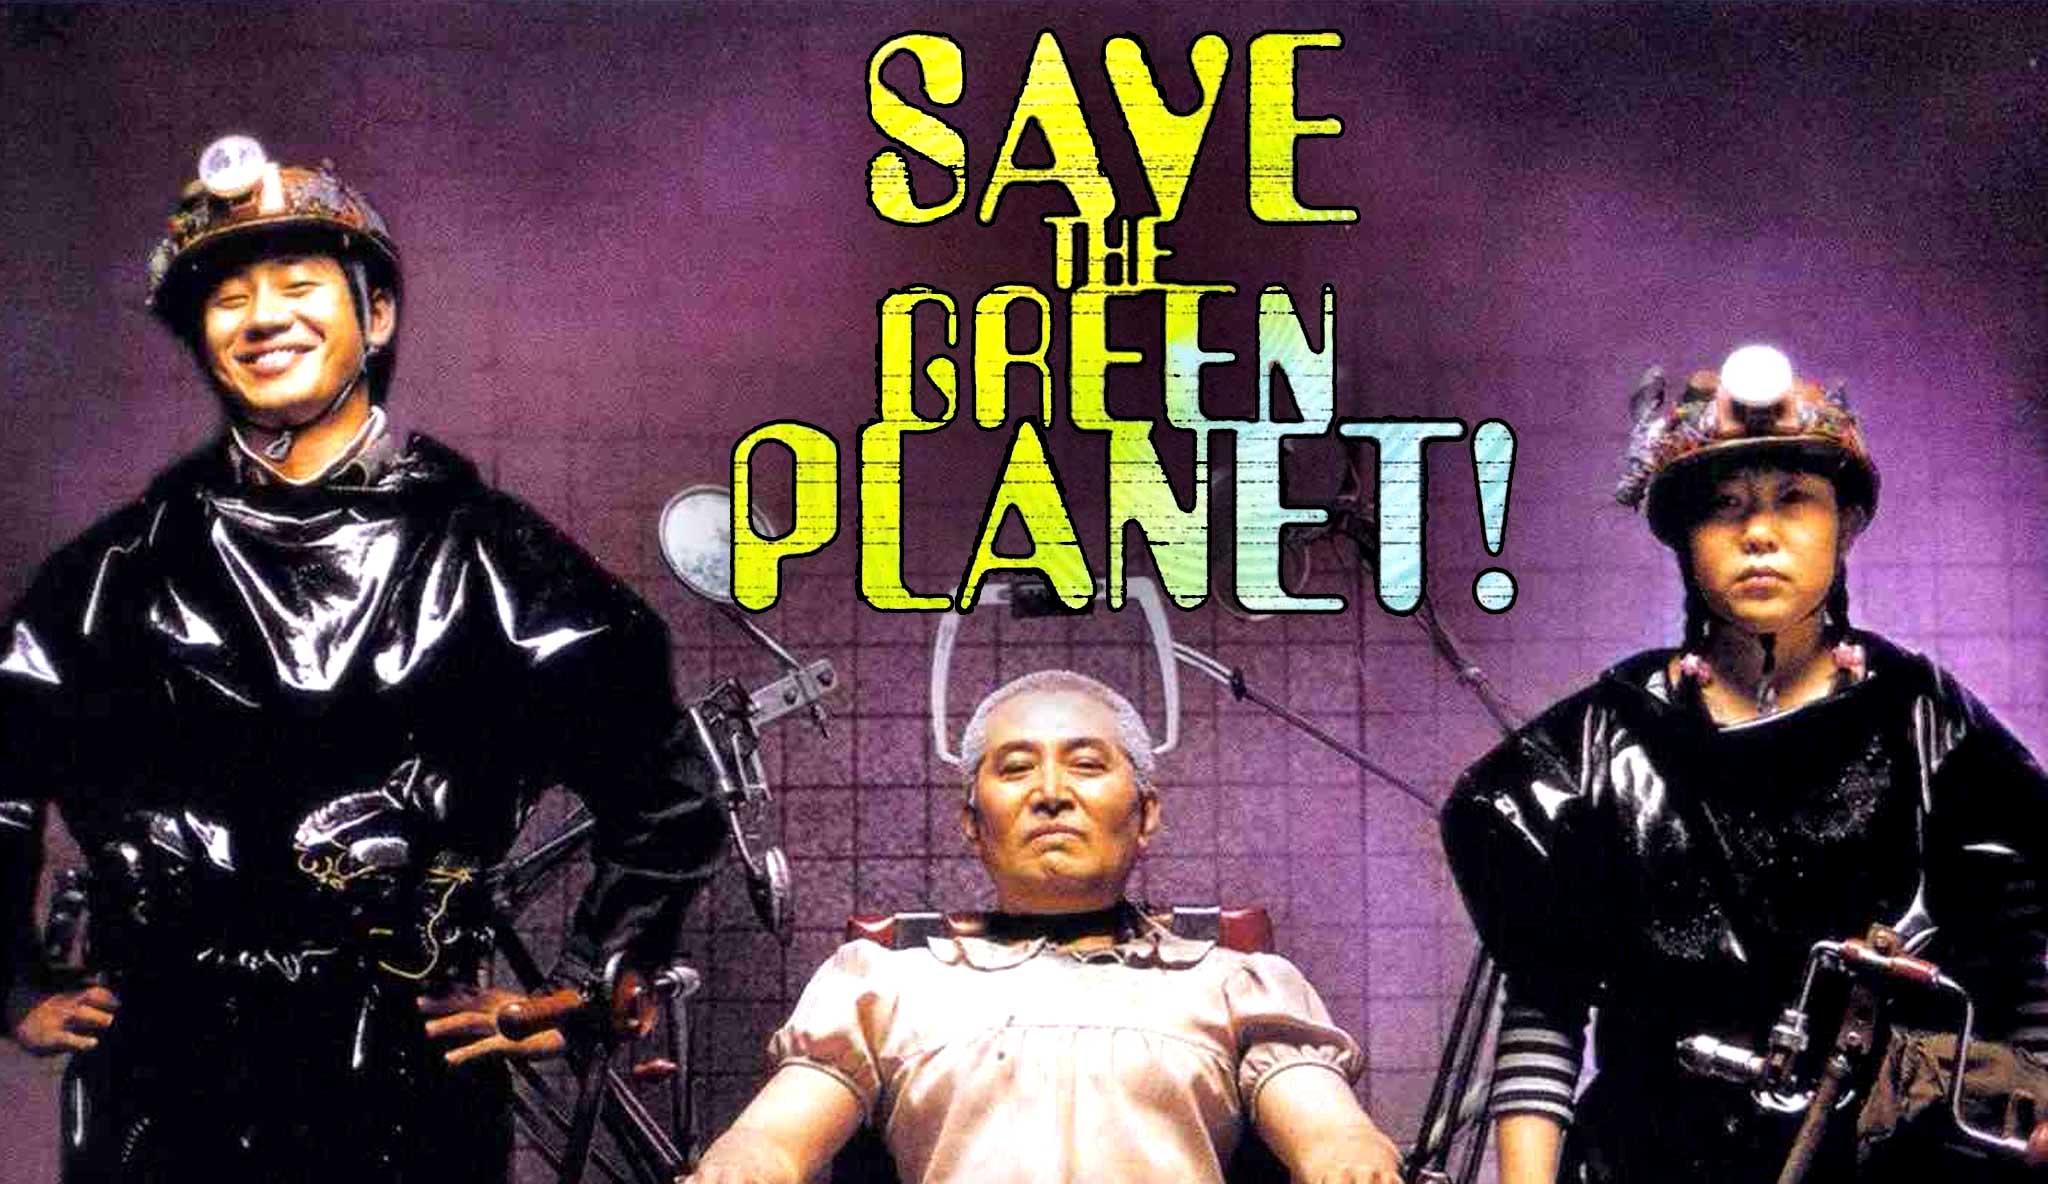 save-the-green-planet\header.jpg